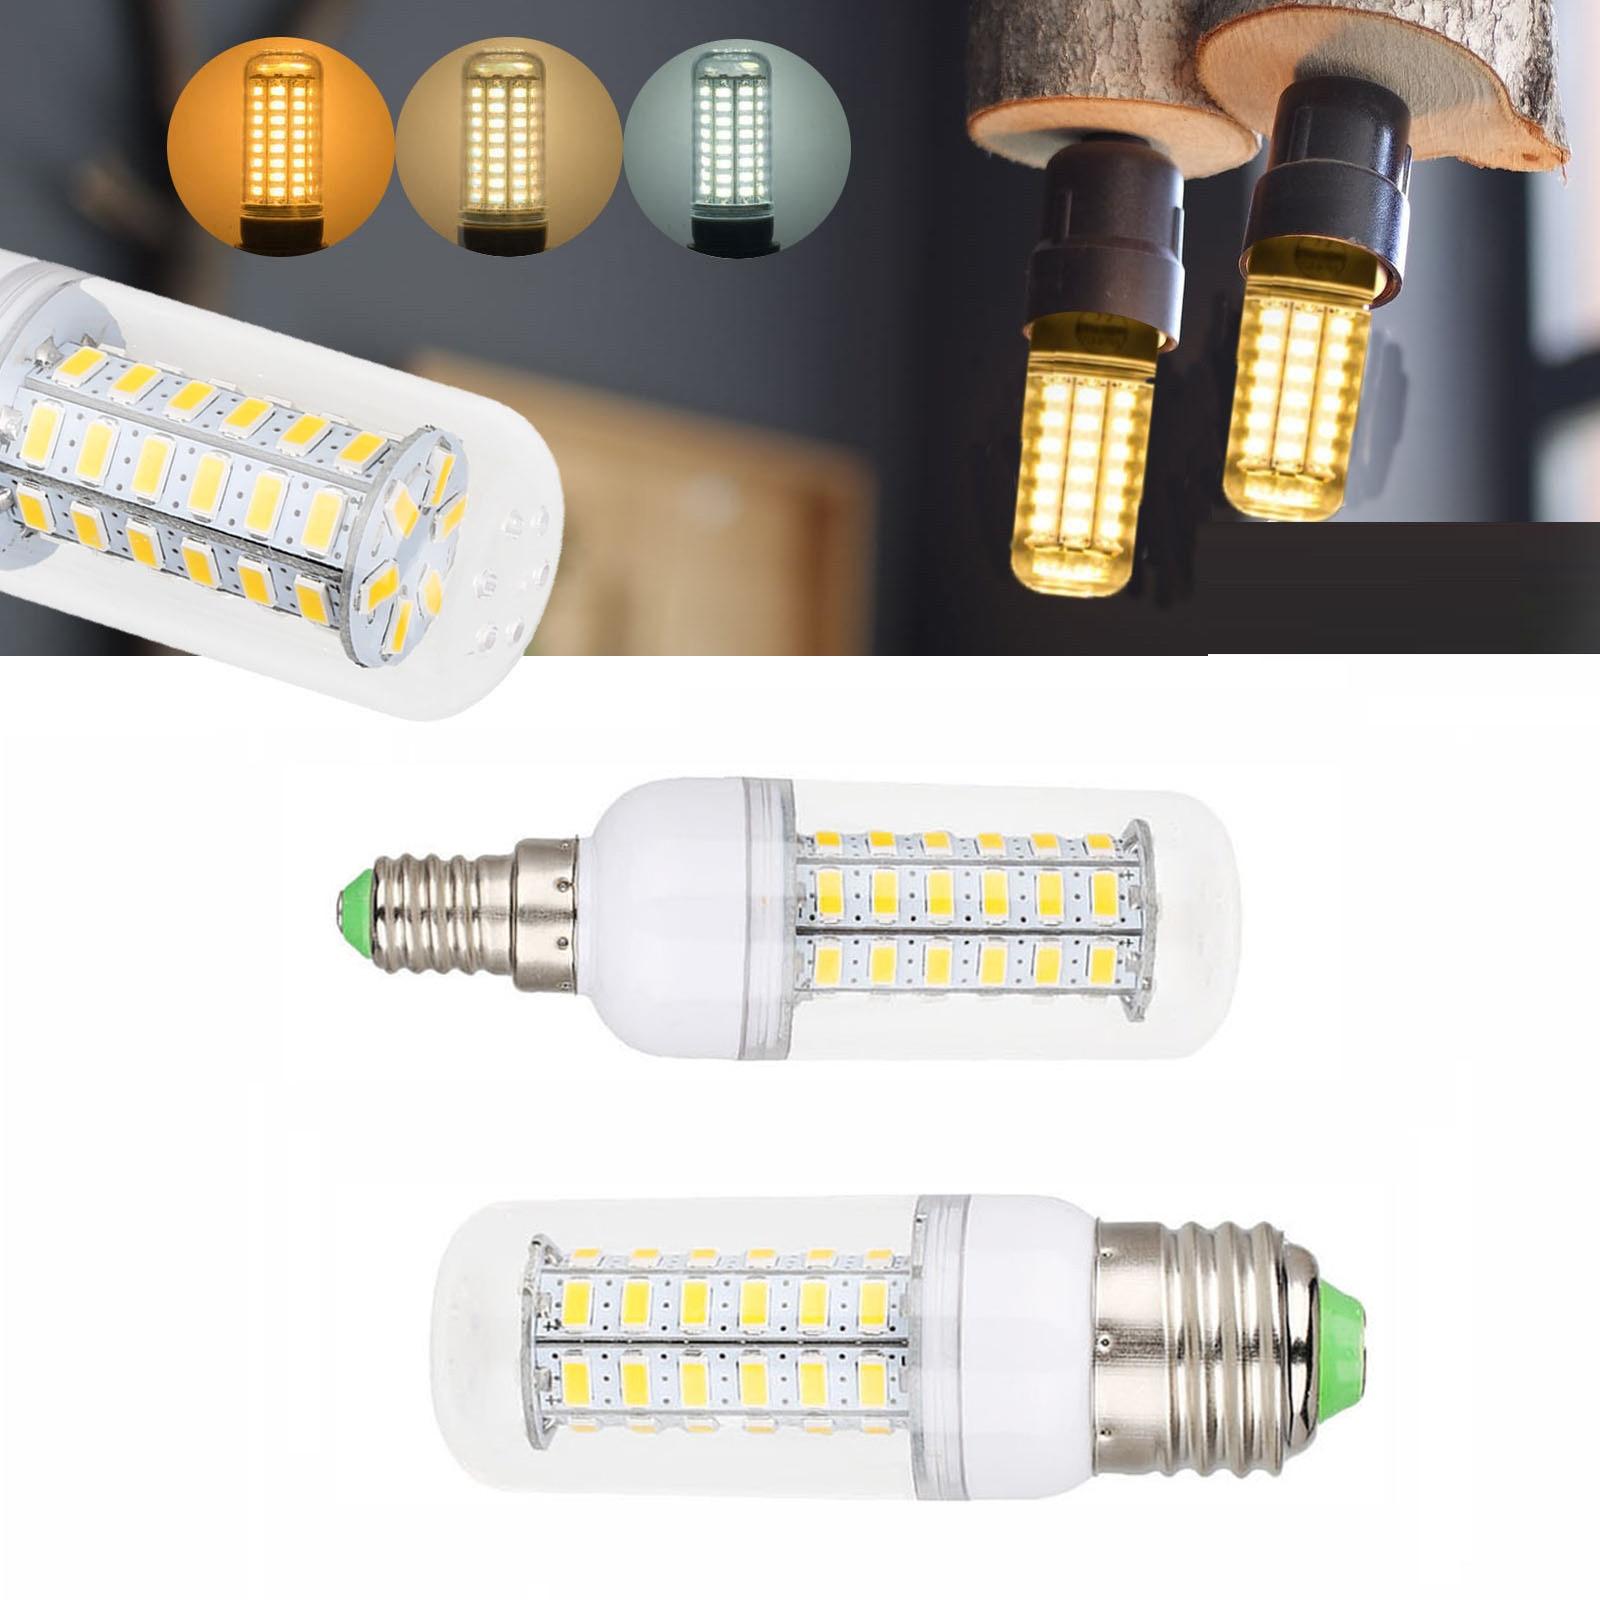 E27 LED Lamp E14 LED Bulb SMD 5730 220V Corn Bulb 24 36 48 56 69 72LEDs Chandelier Candle LED Light For Home Decoration Ampoule